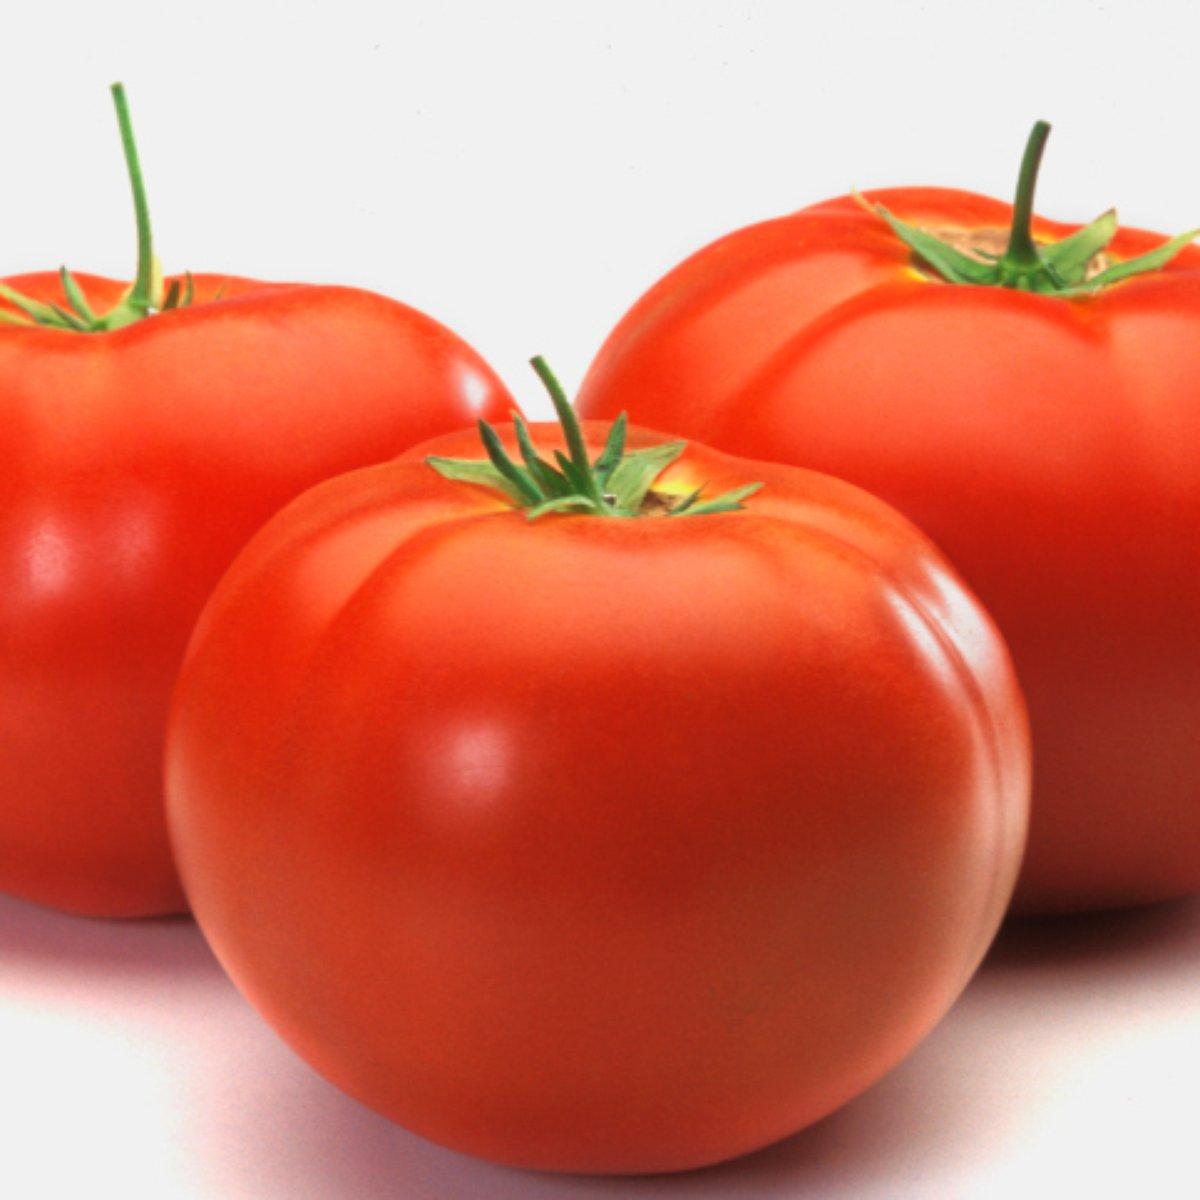 Verduras con menos calorias para bajar de peso